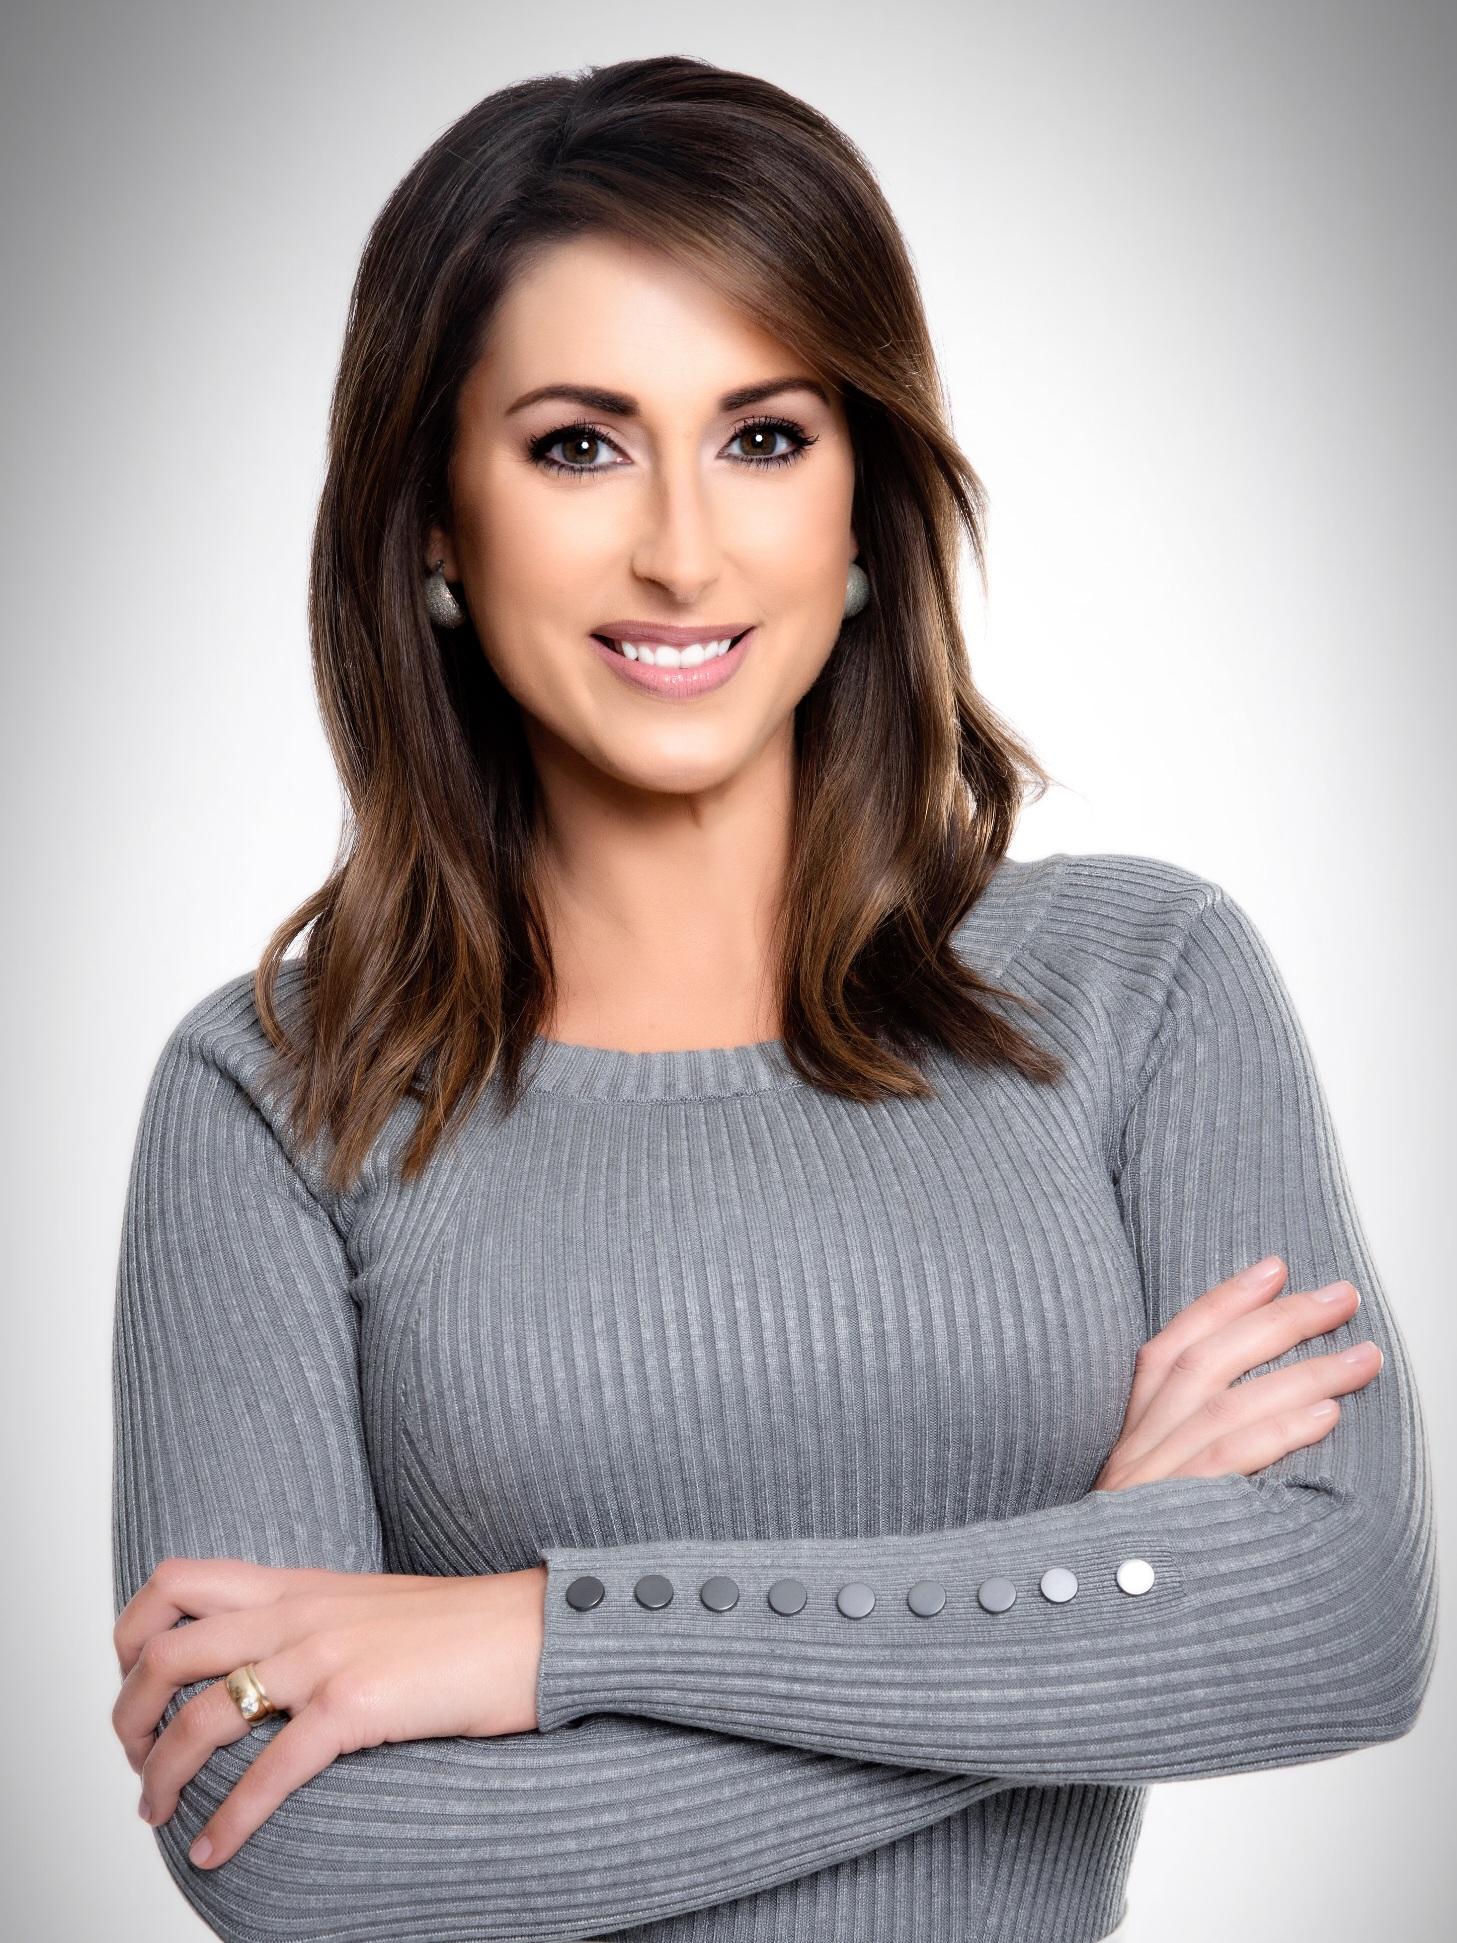 Brooke Martin - EDGE|X Fireside Chat ModeratorWISH-TV Anchor & Reporter